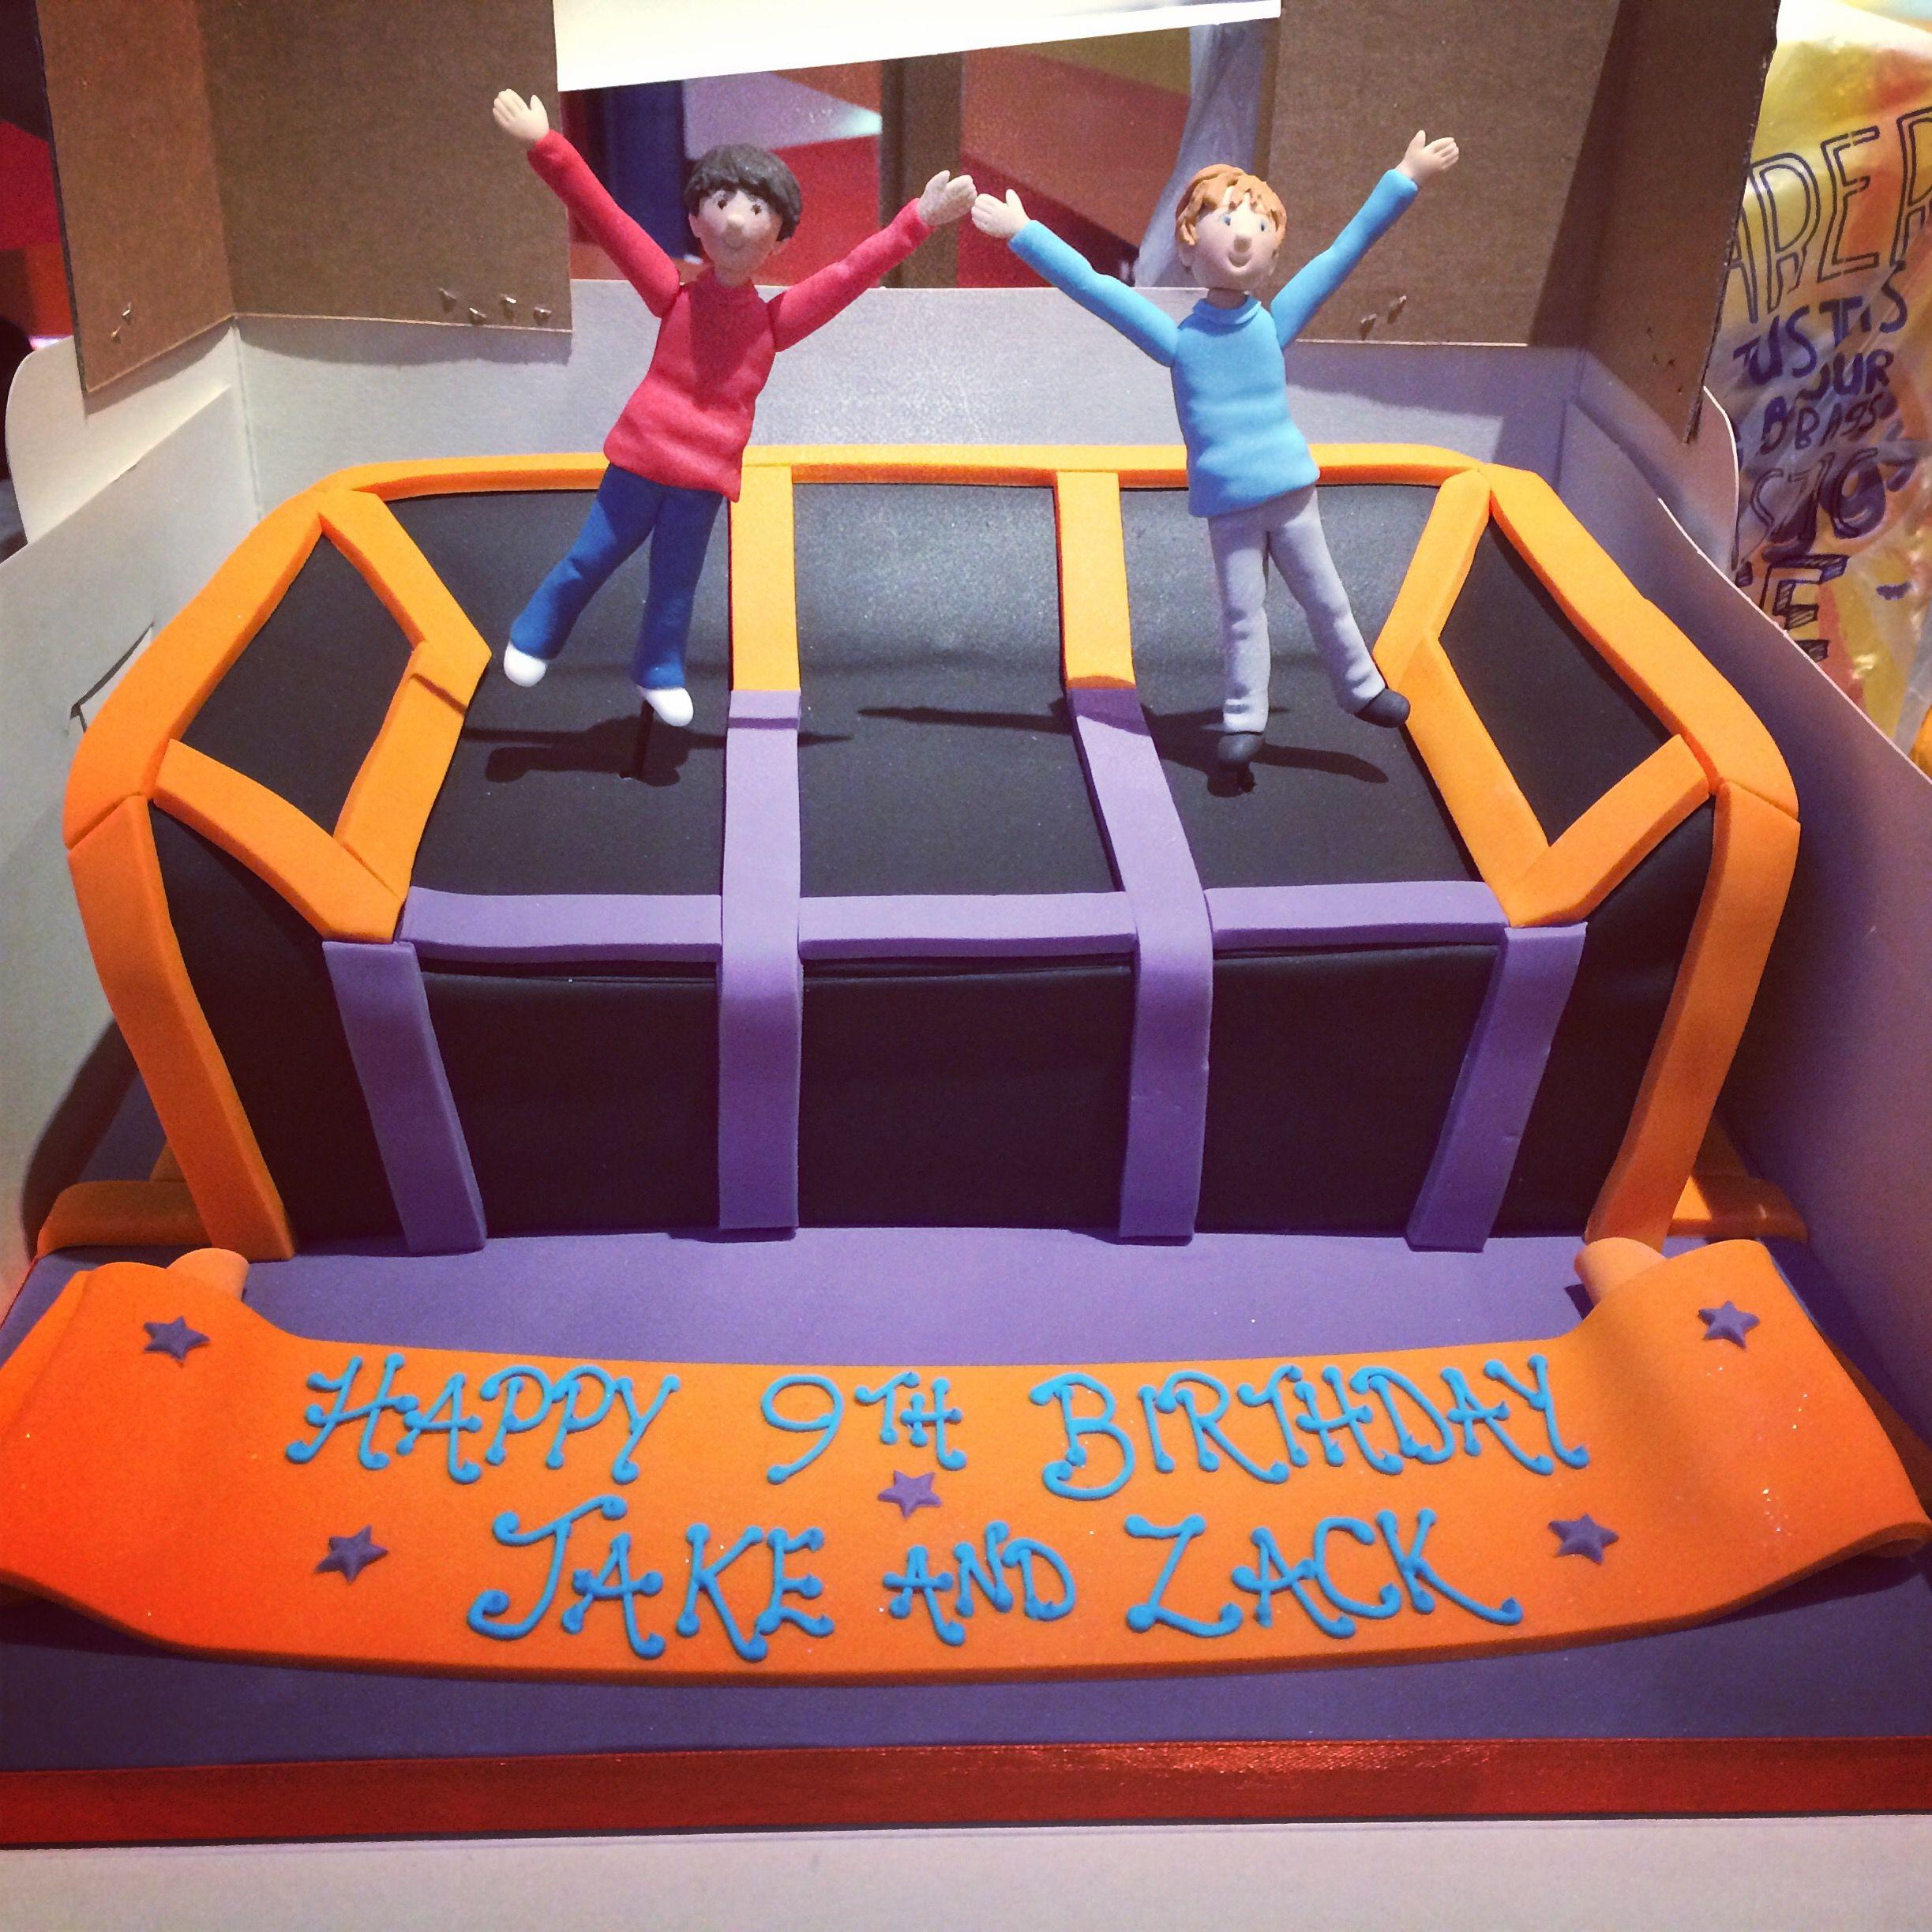 Party cake of 2015! #party #cakeideas #bounce #bouncingmen